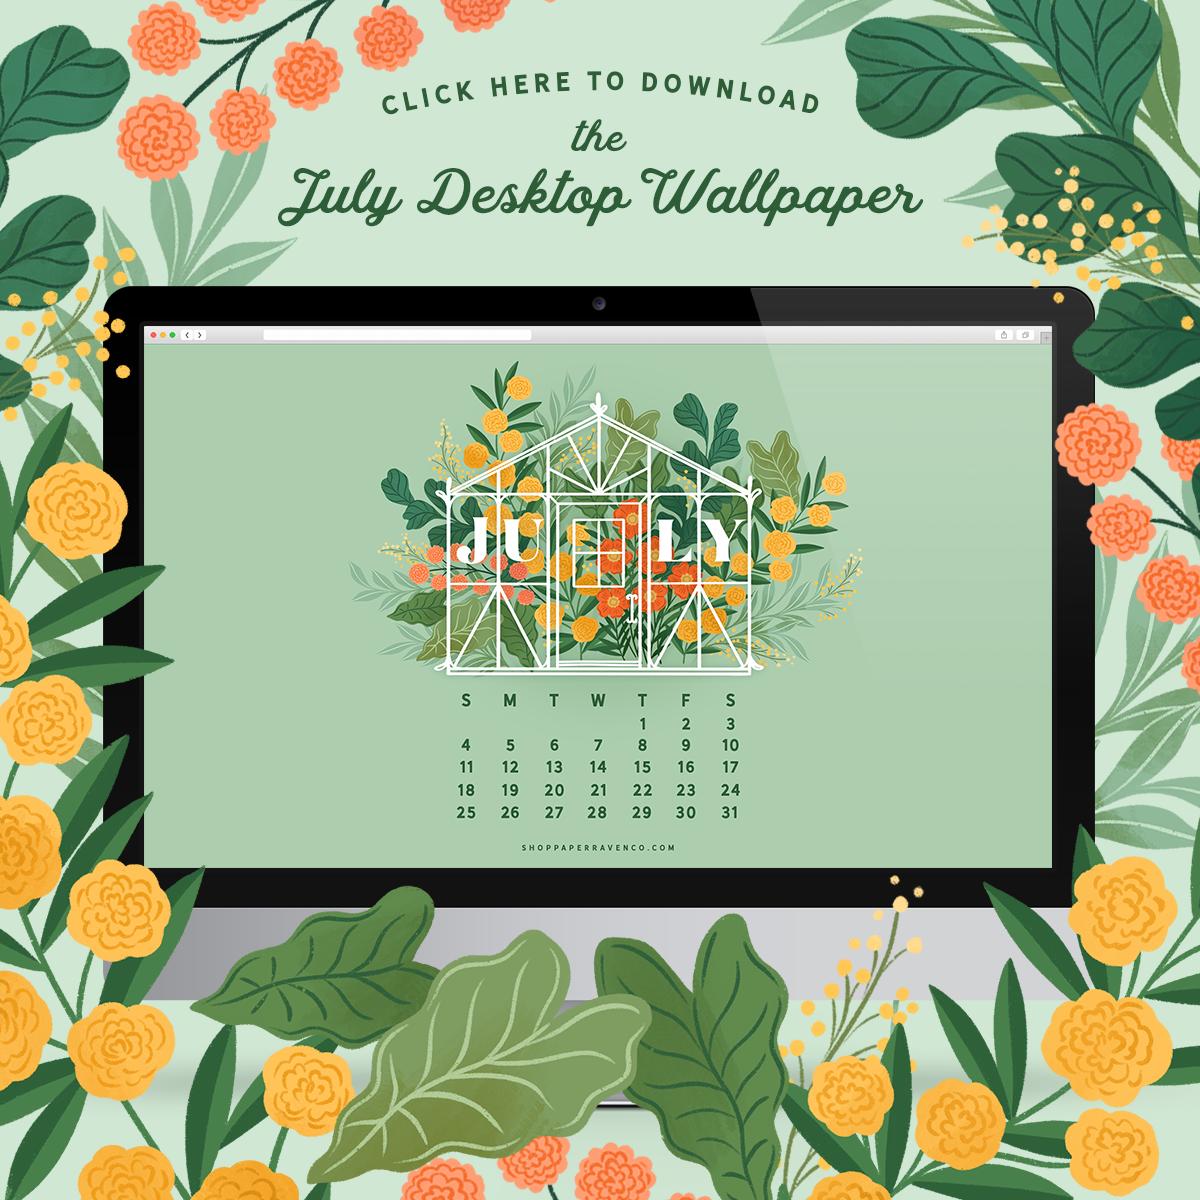 July 2021 Illustrated Desktop Wallpaper by Paper Raven Co. #dressyourtech #desktopwallpaper #desktopdownload